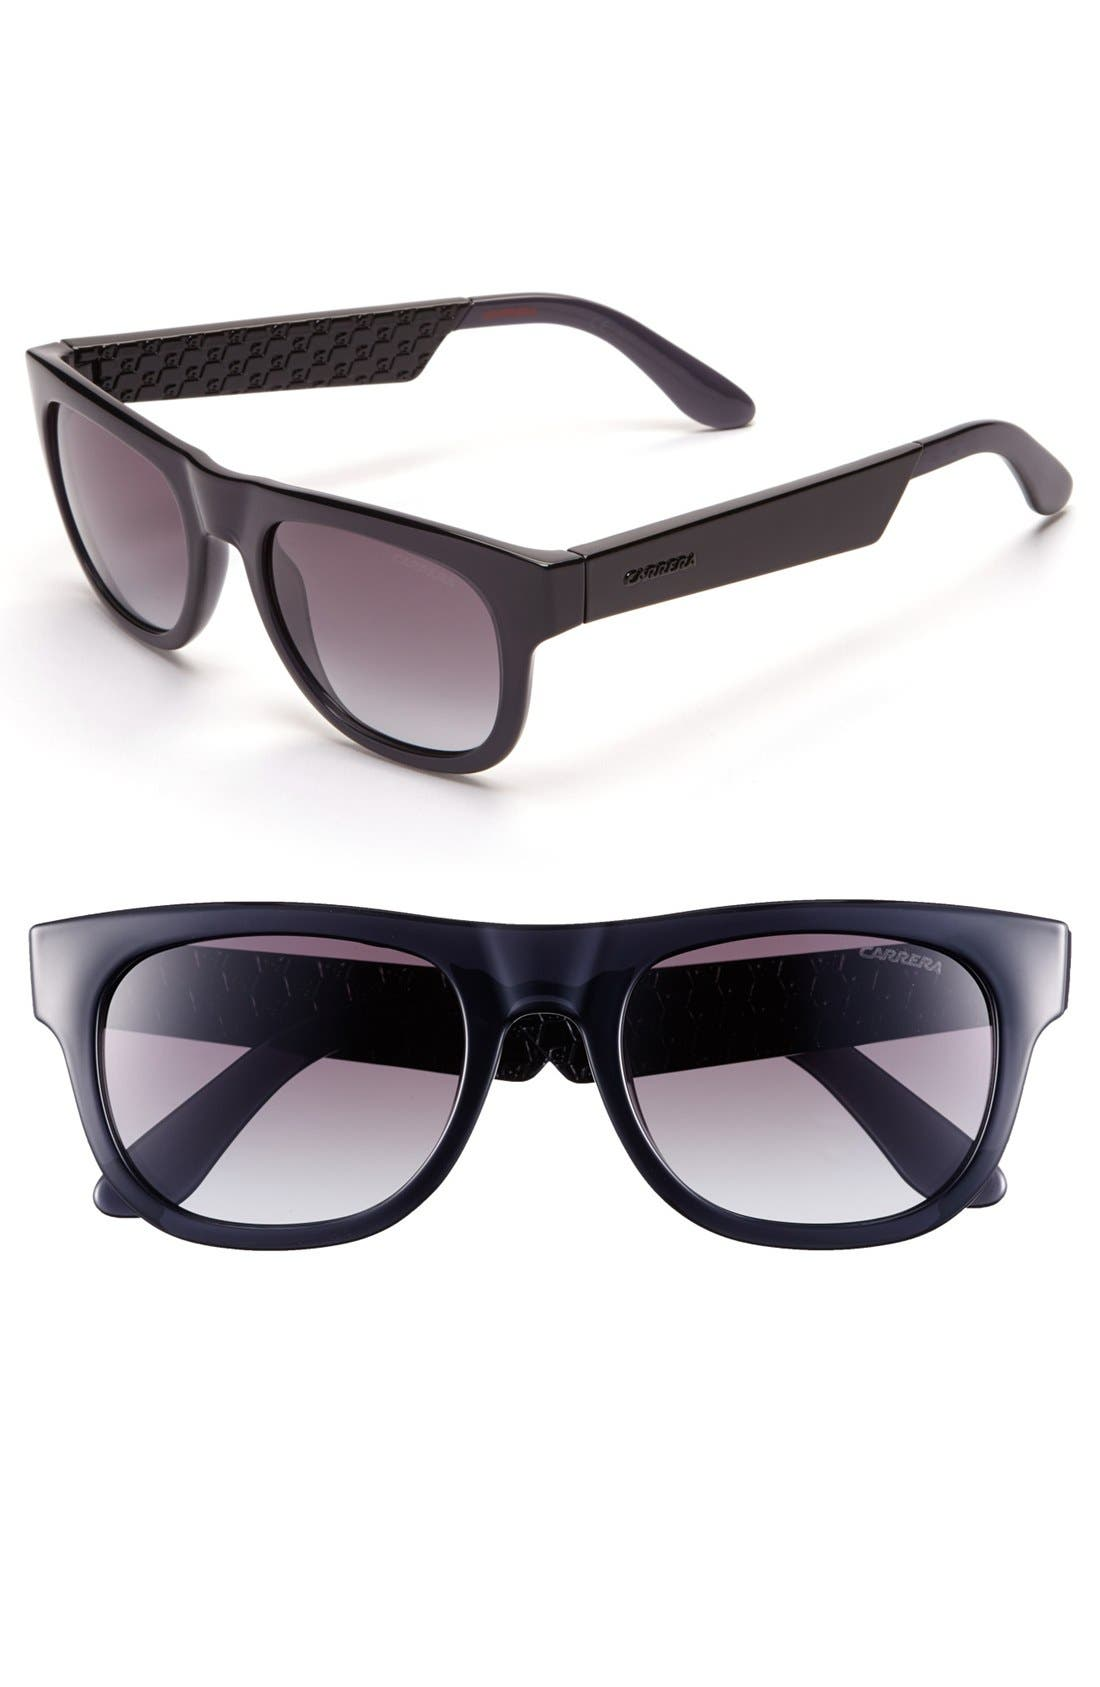 Main Image - Carrera Eyewear 52mm Retro Sunglasses